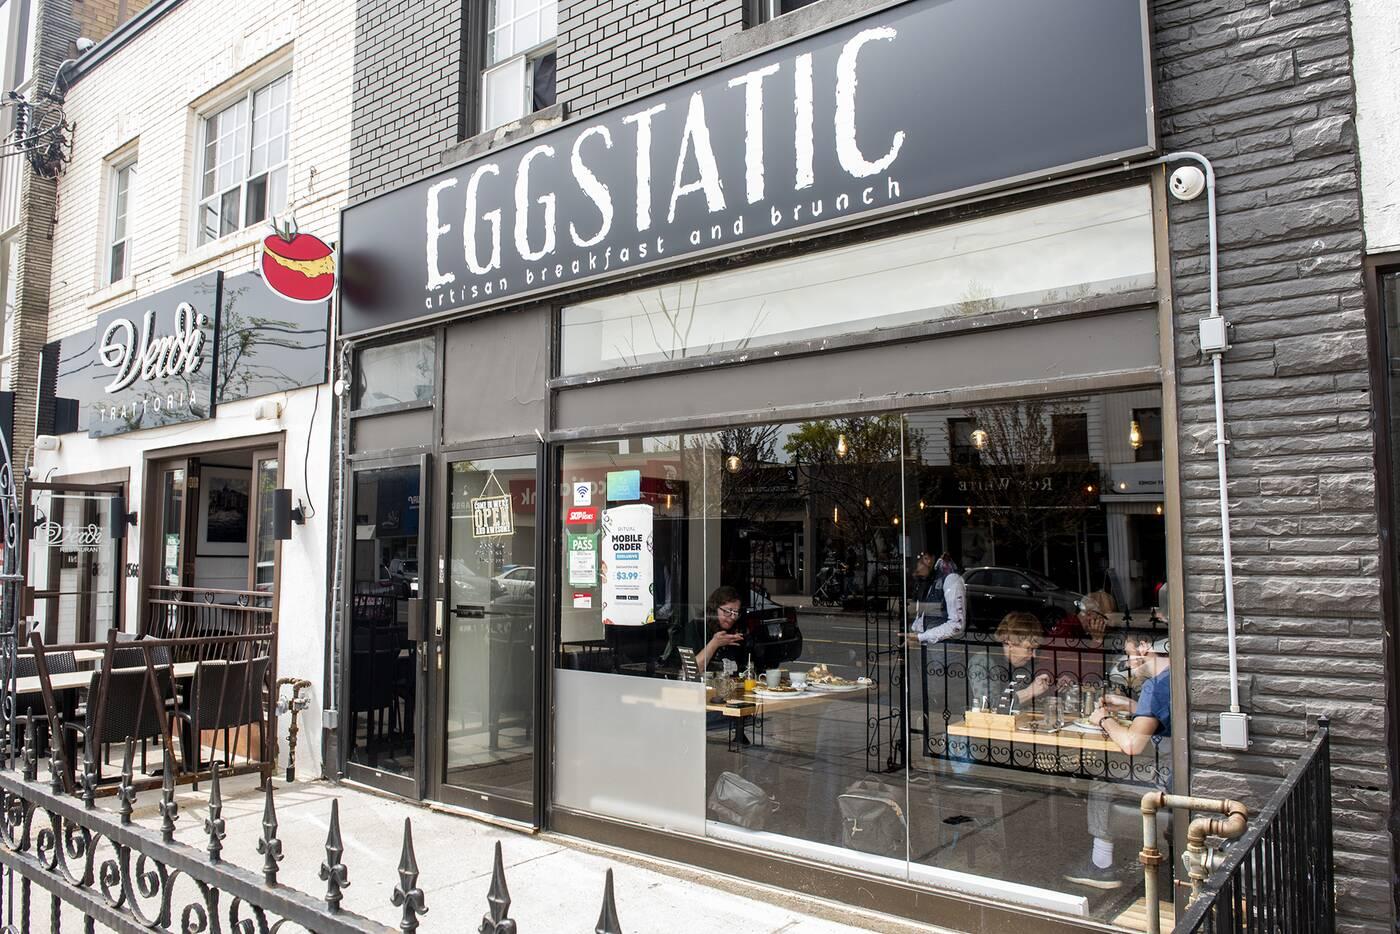 Eggstatic Toronto